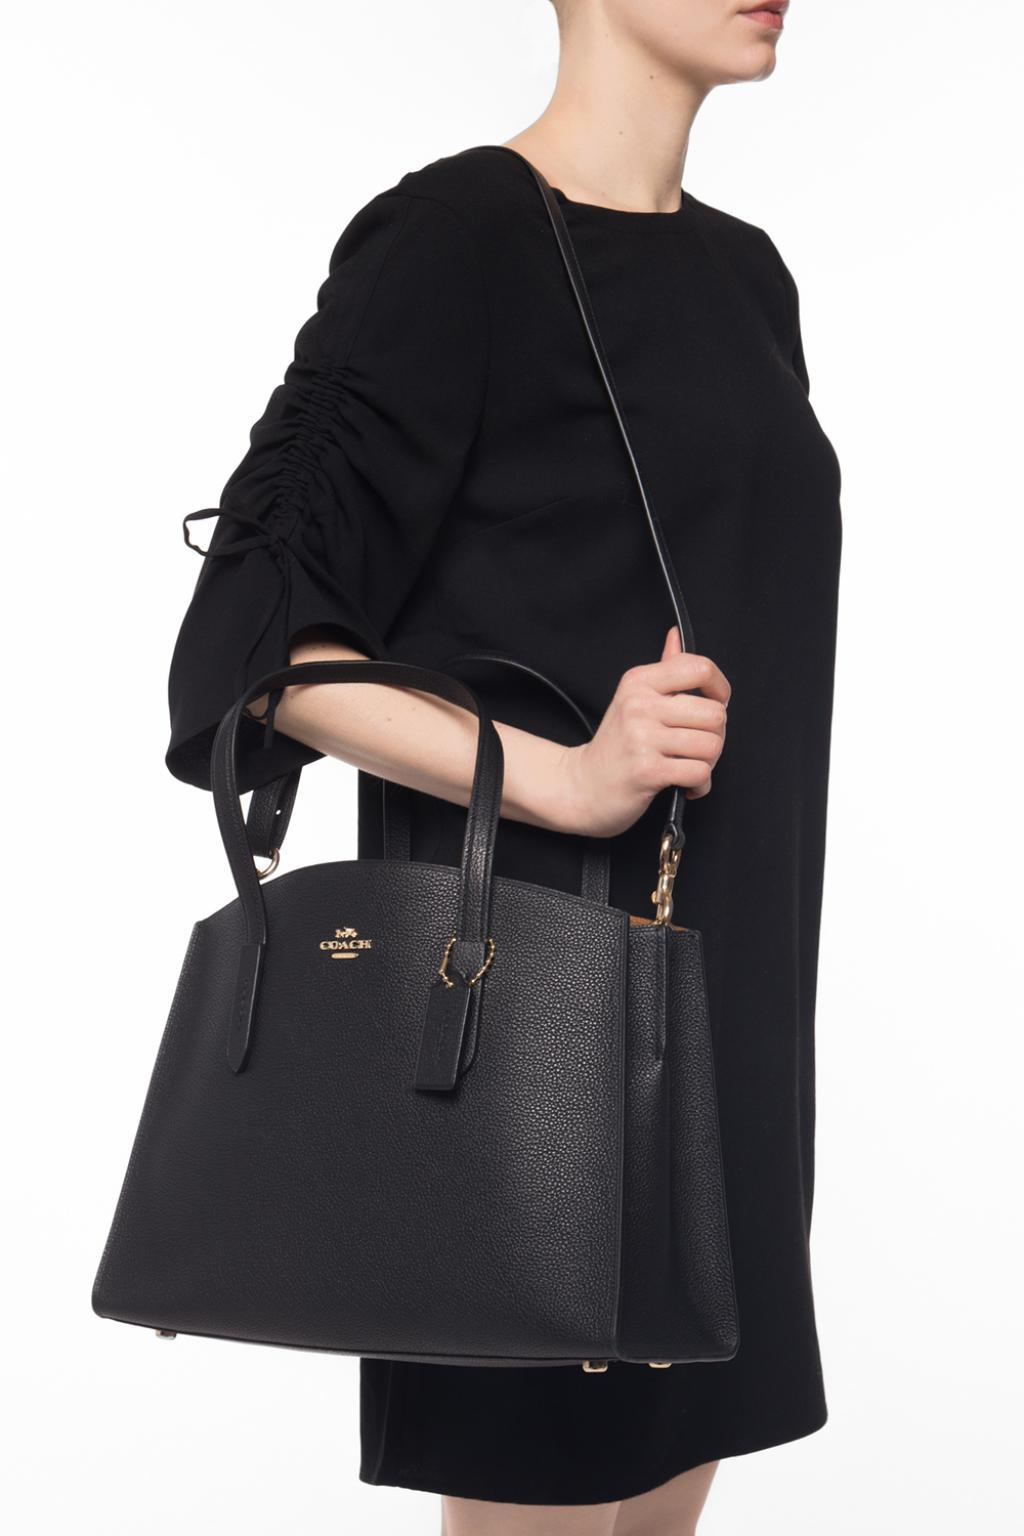 0ff49b65f3 Lyst - COACH  charlie Carryall  Shoulder Bag in Black